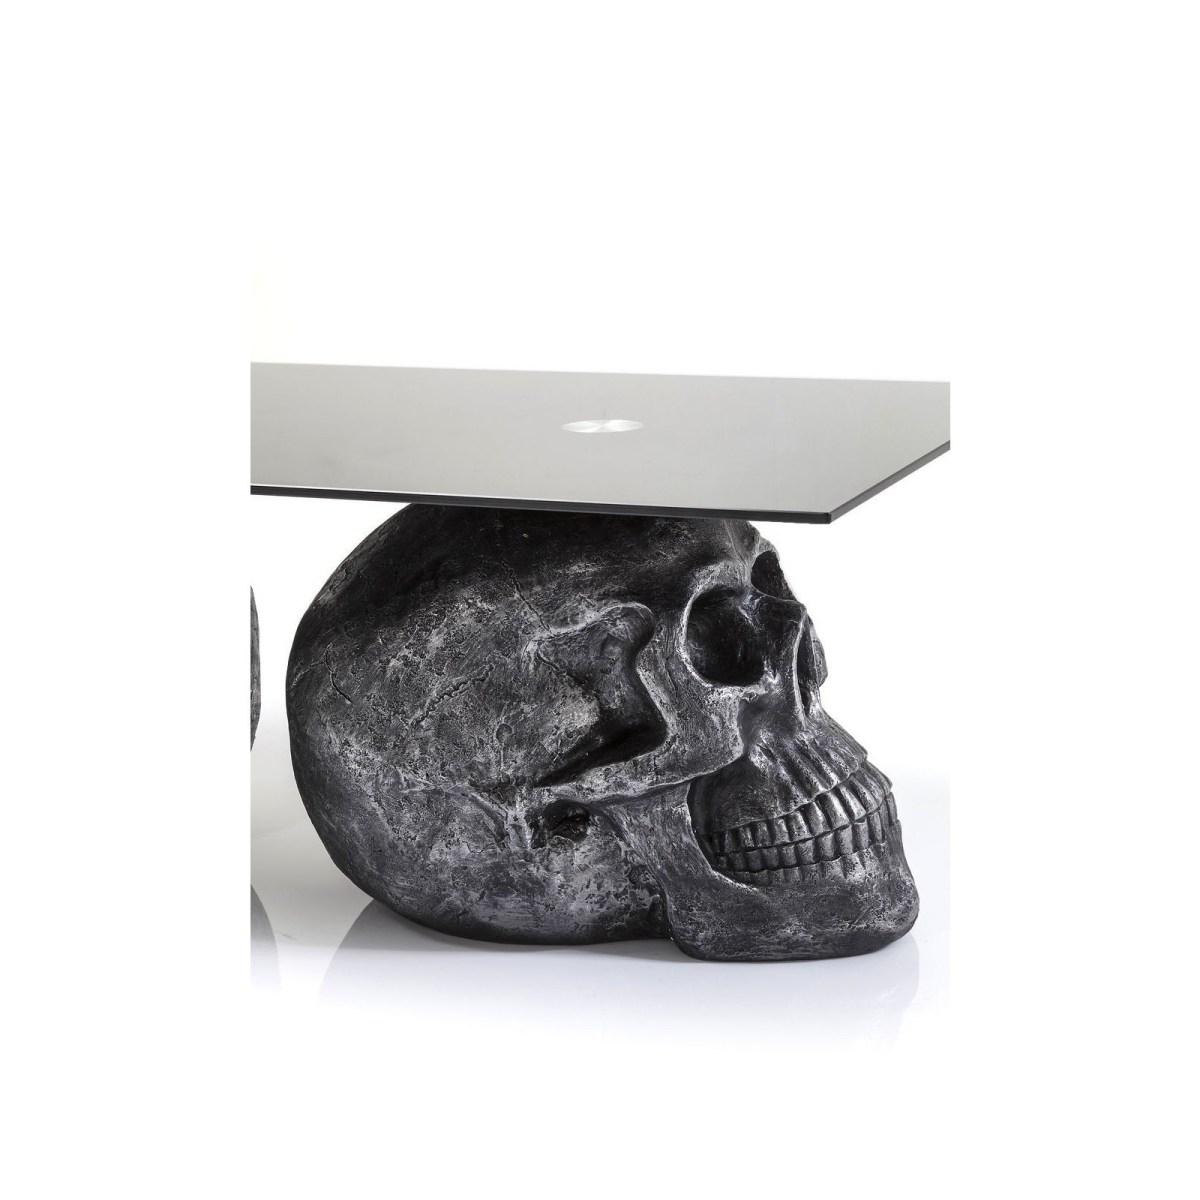 Soldes Kare Design Meuble > Table Basse Table basse Skull Rockstar by Geiss 120x60 cm Kare Design